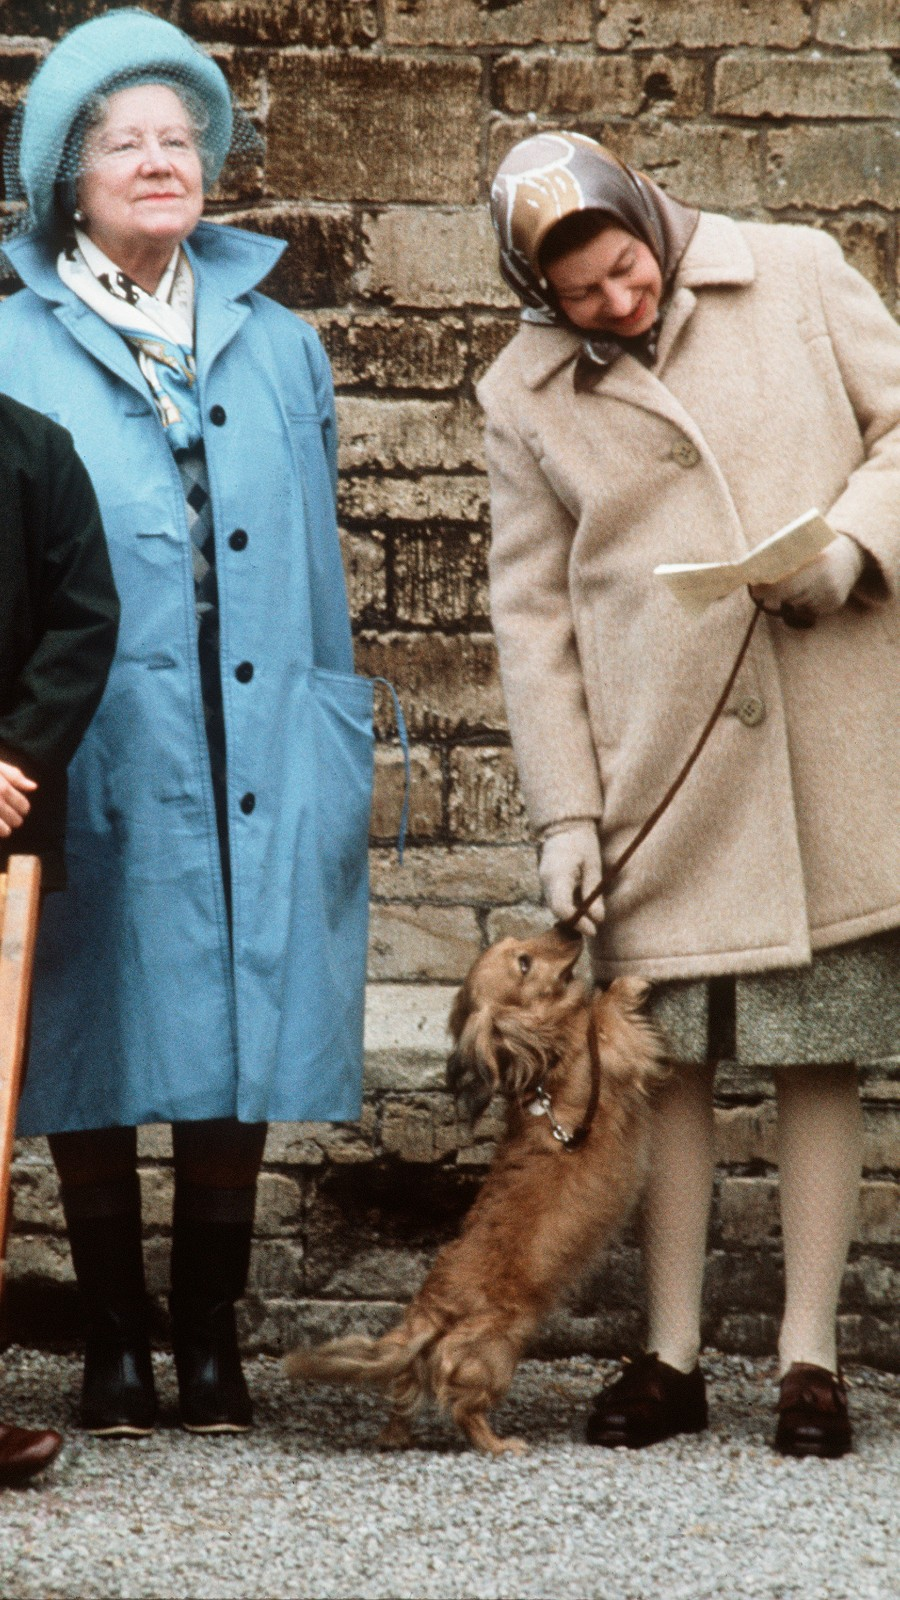 La reine, Elizabeth II avec son corgi et la reine mère.